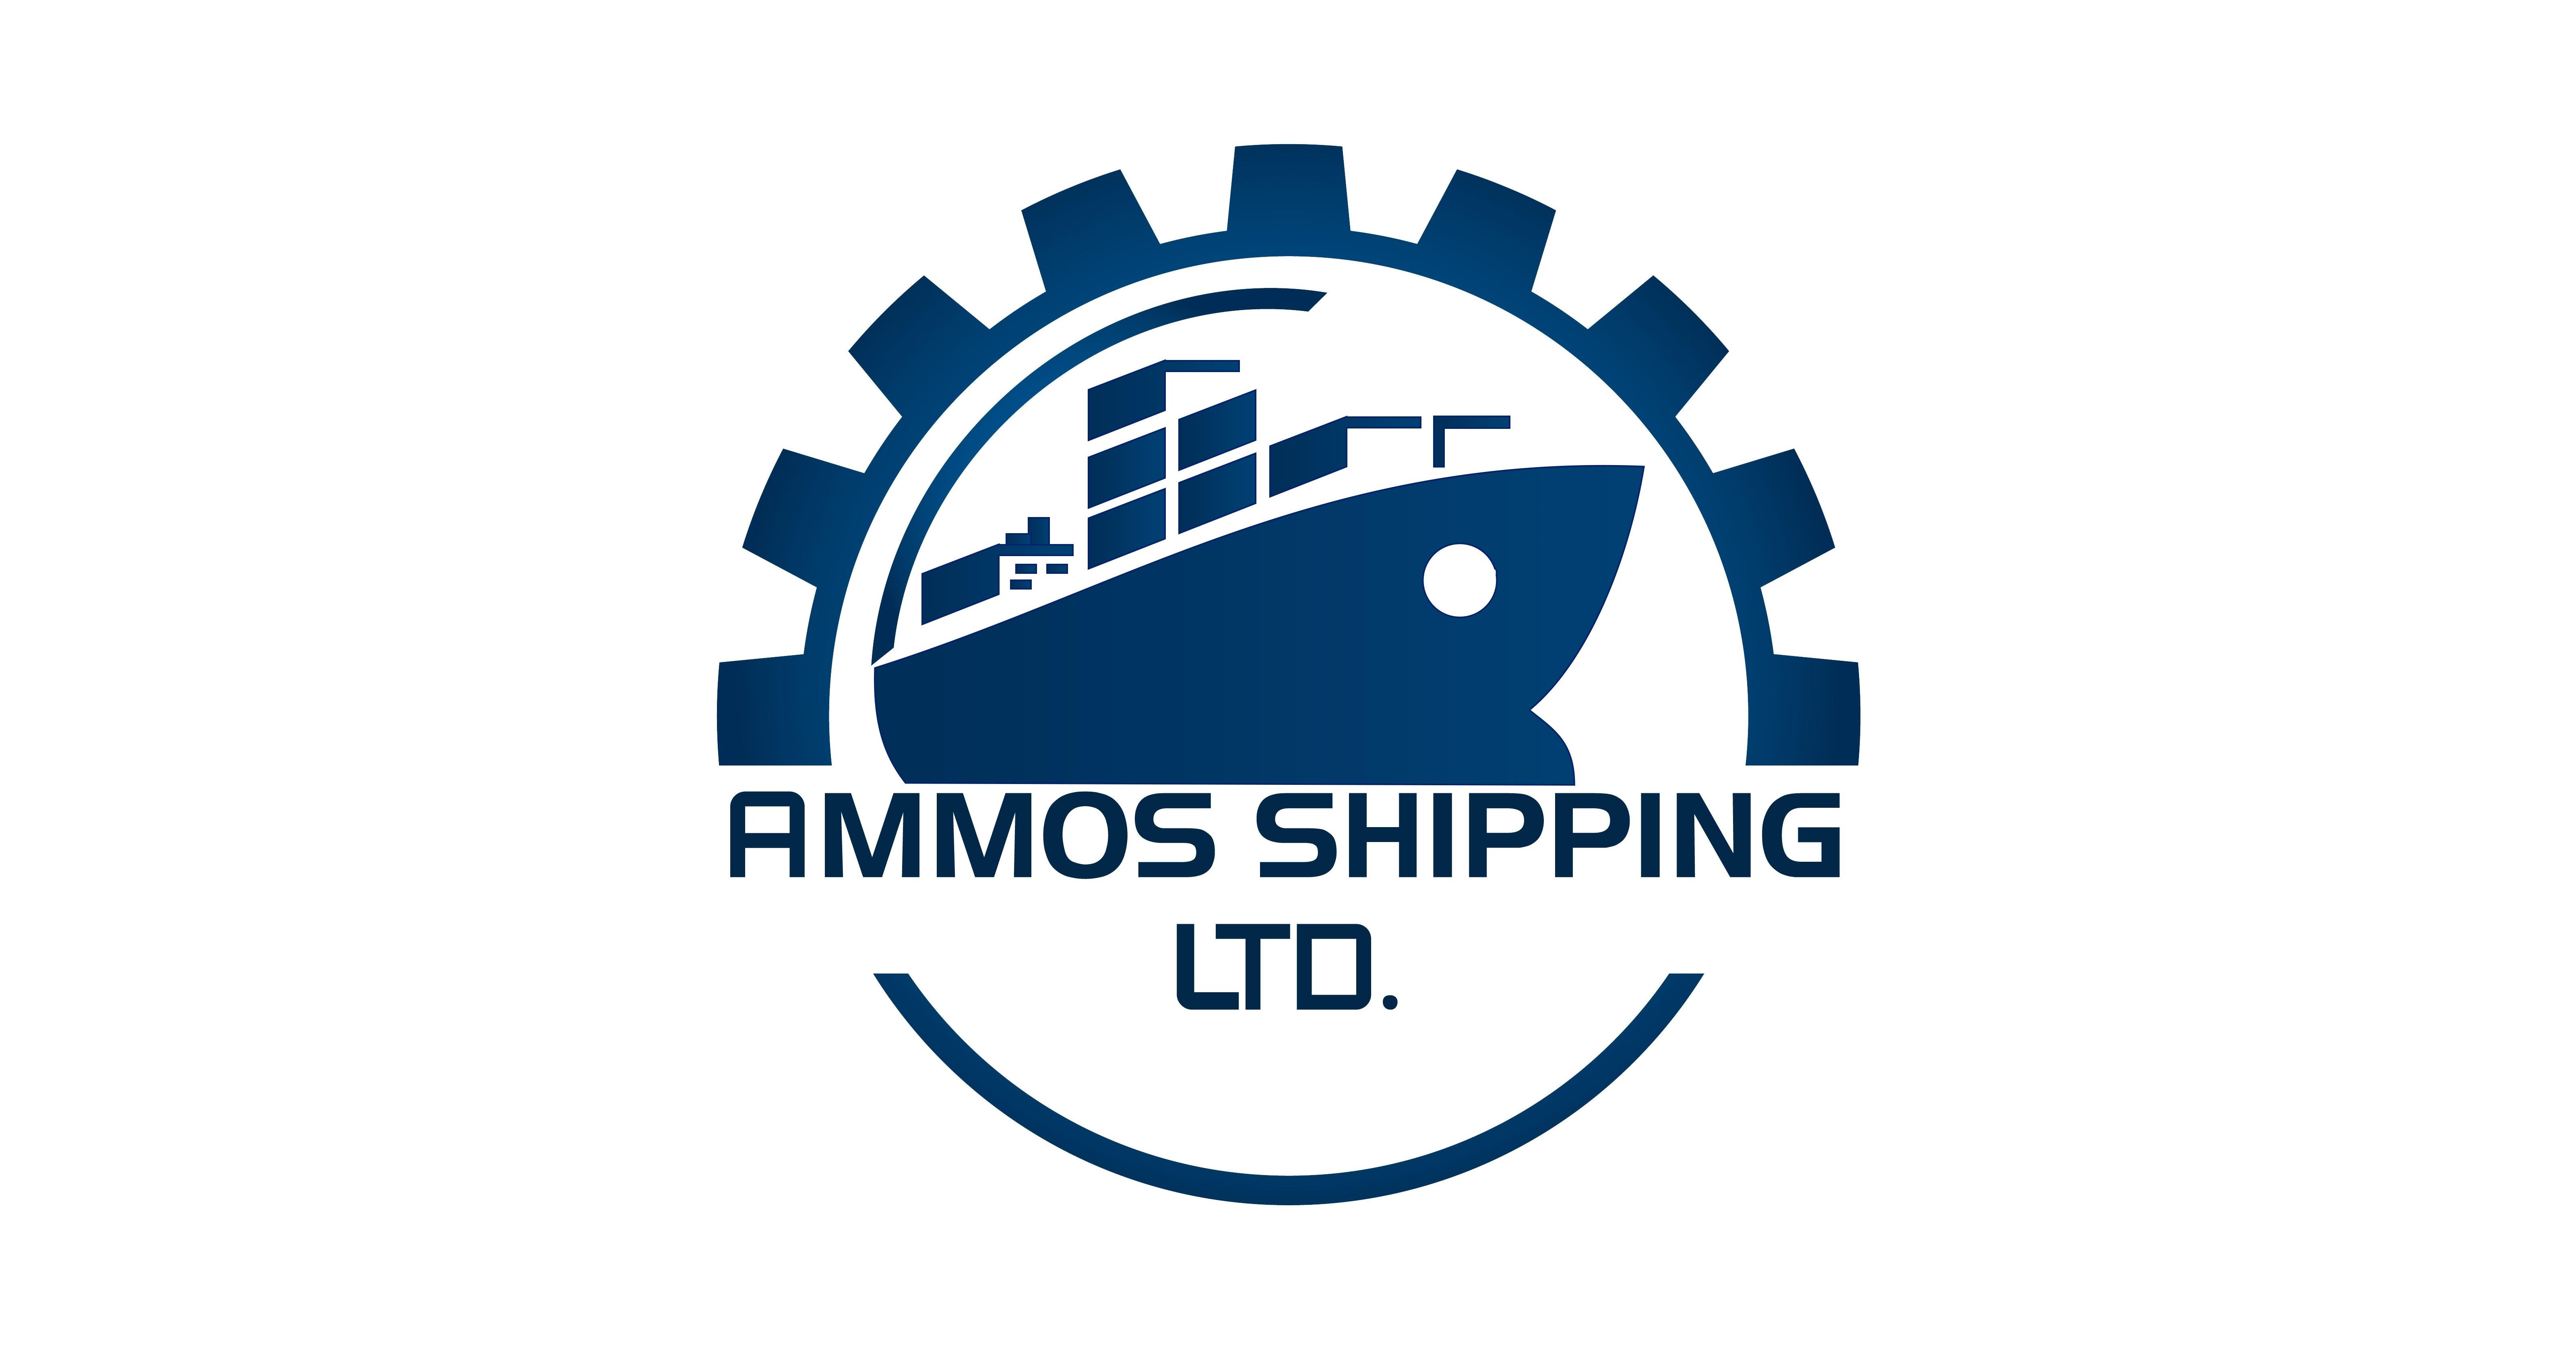 Job: Sales Representative at Ammos Shipping LTD in Cairo